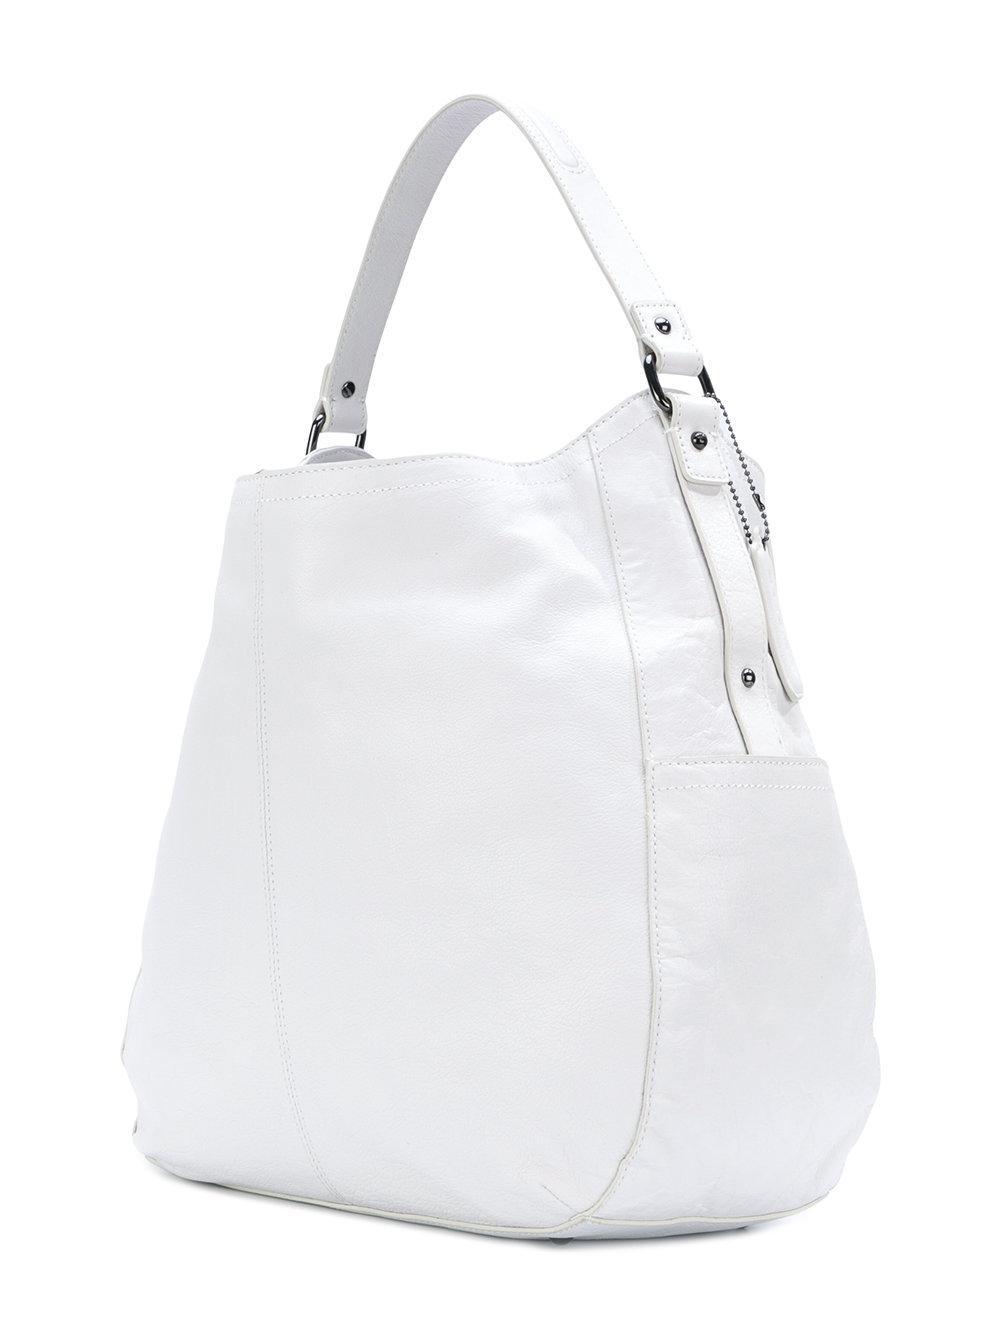 2954ec7177d4de Juicy Couture Ms Pippa Hobo Bag in White - Lyst